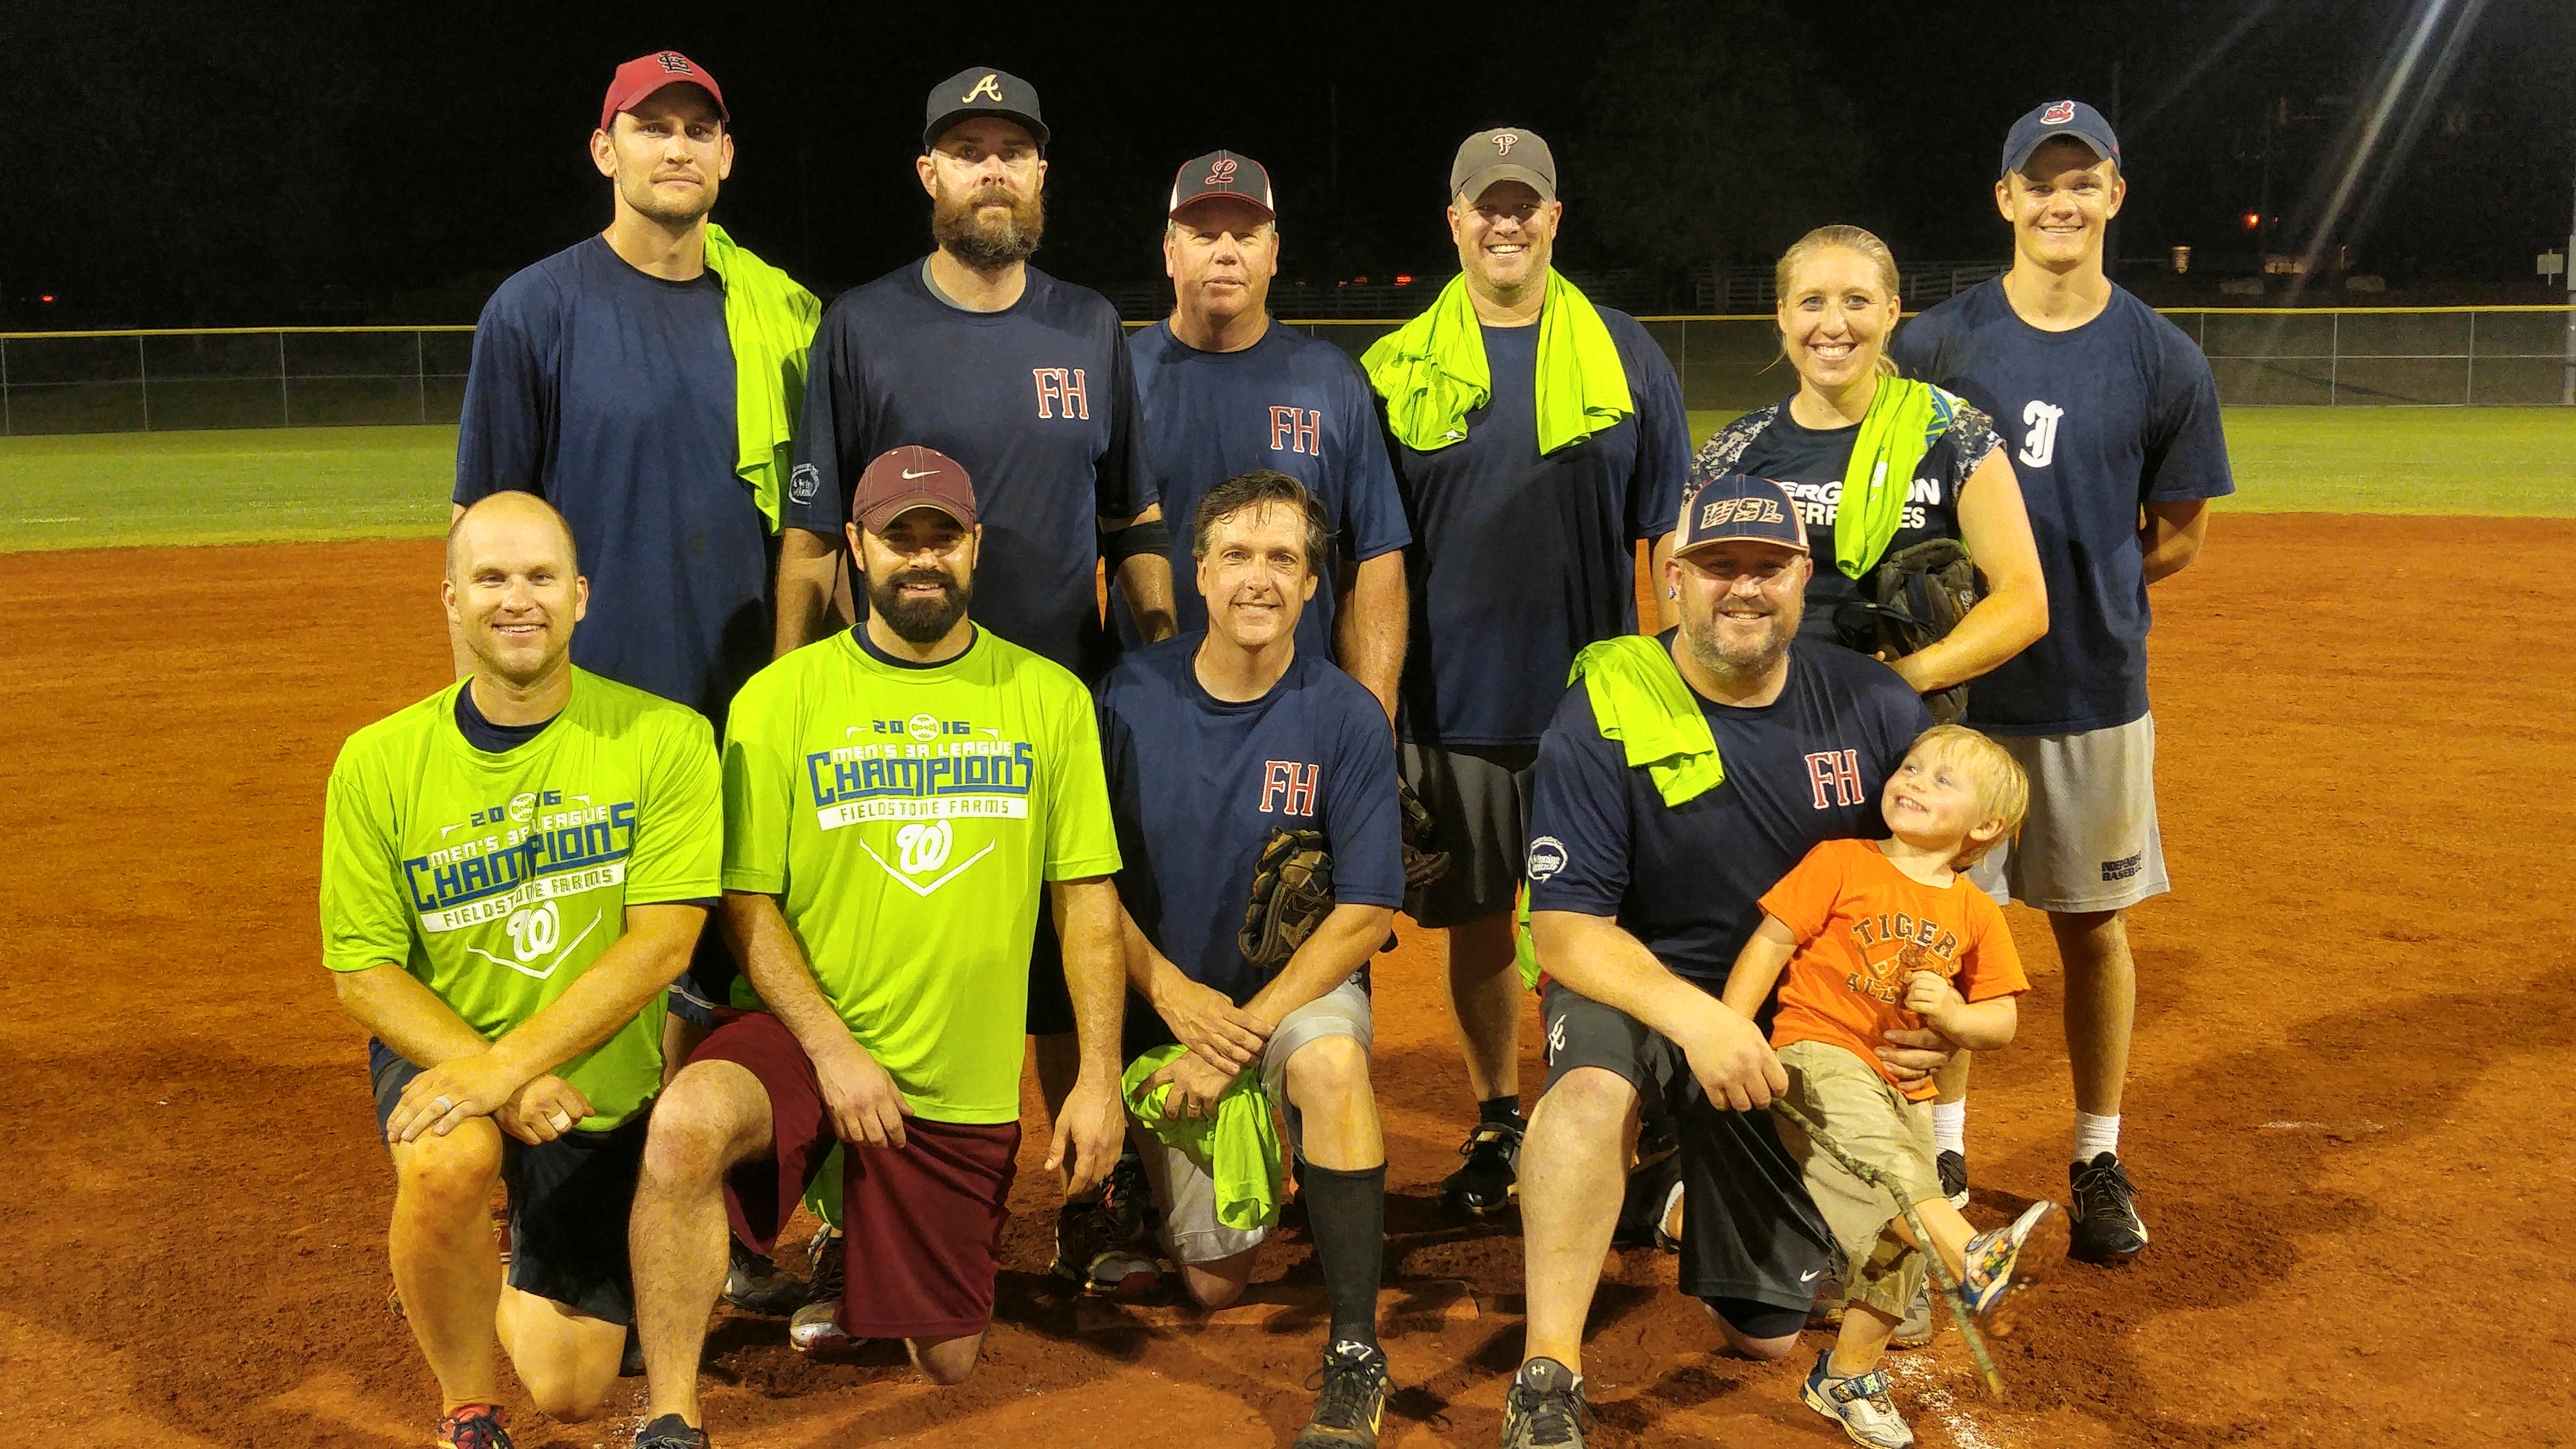 Charlotte Softball League - SportsLink